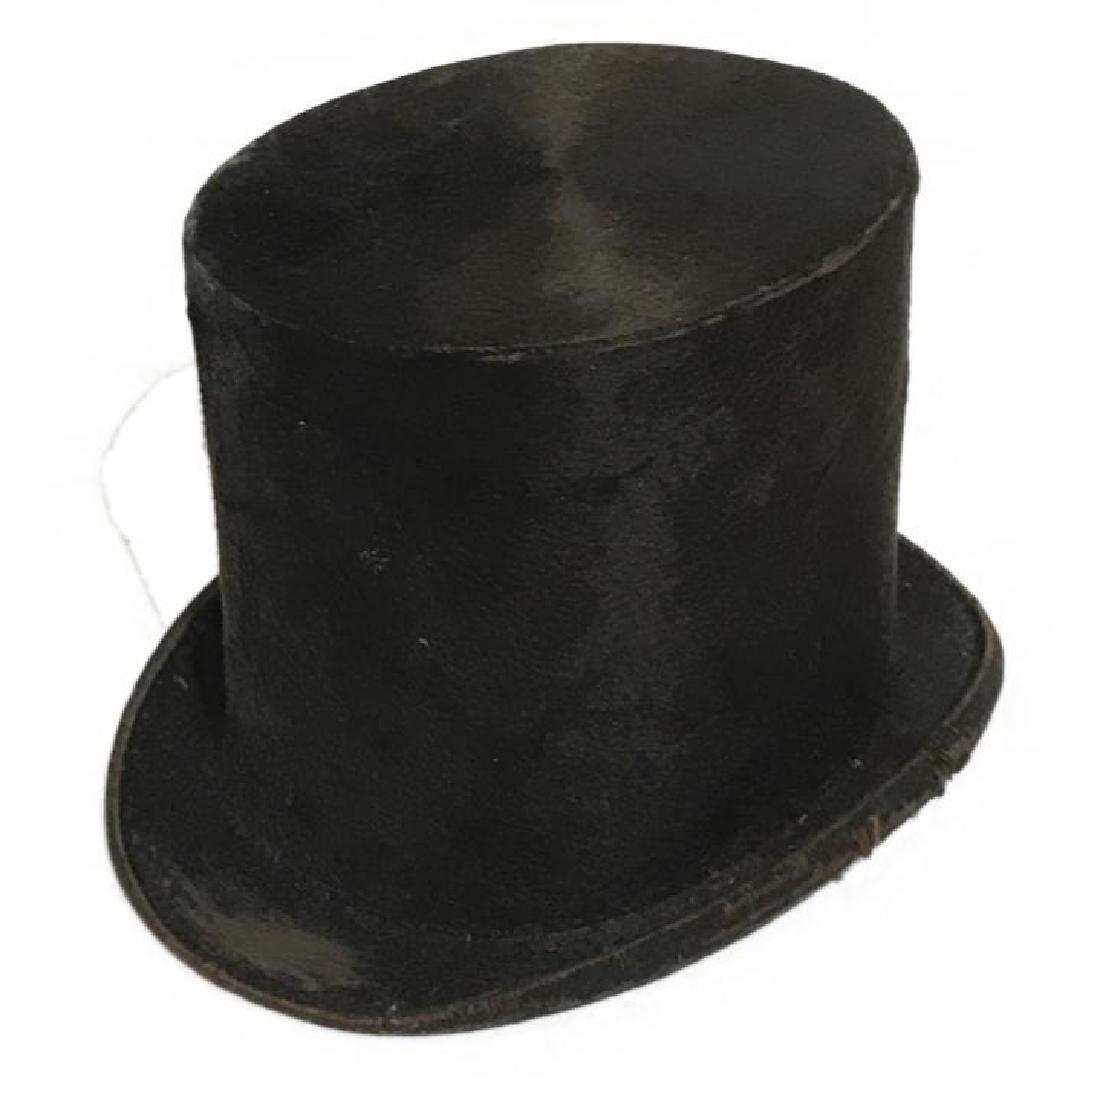 Antique Top Hat Satchell & Son London